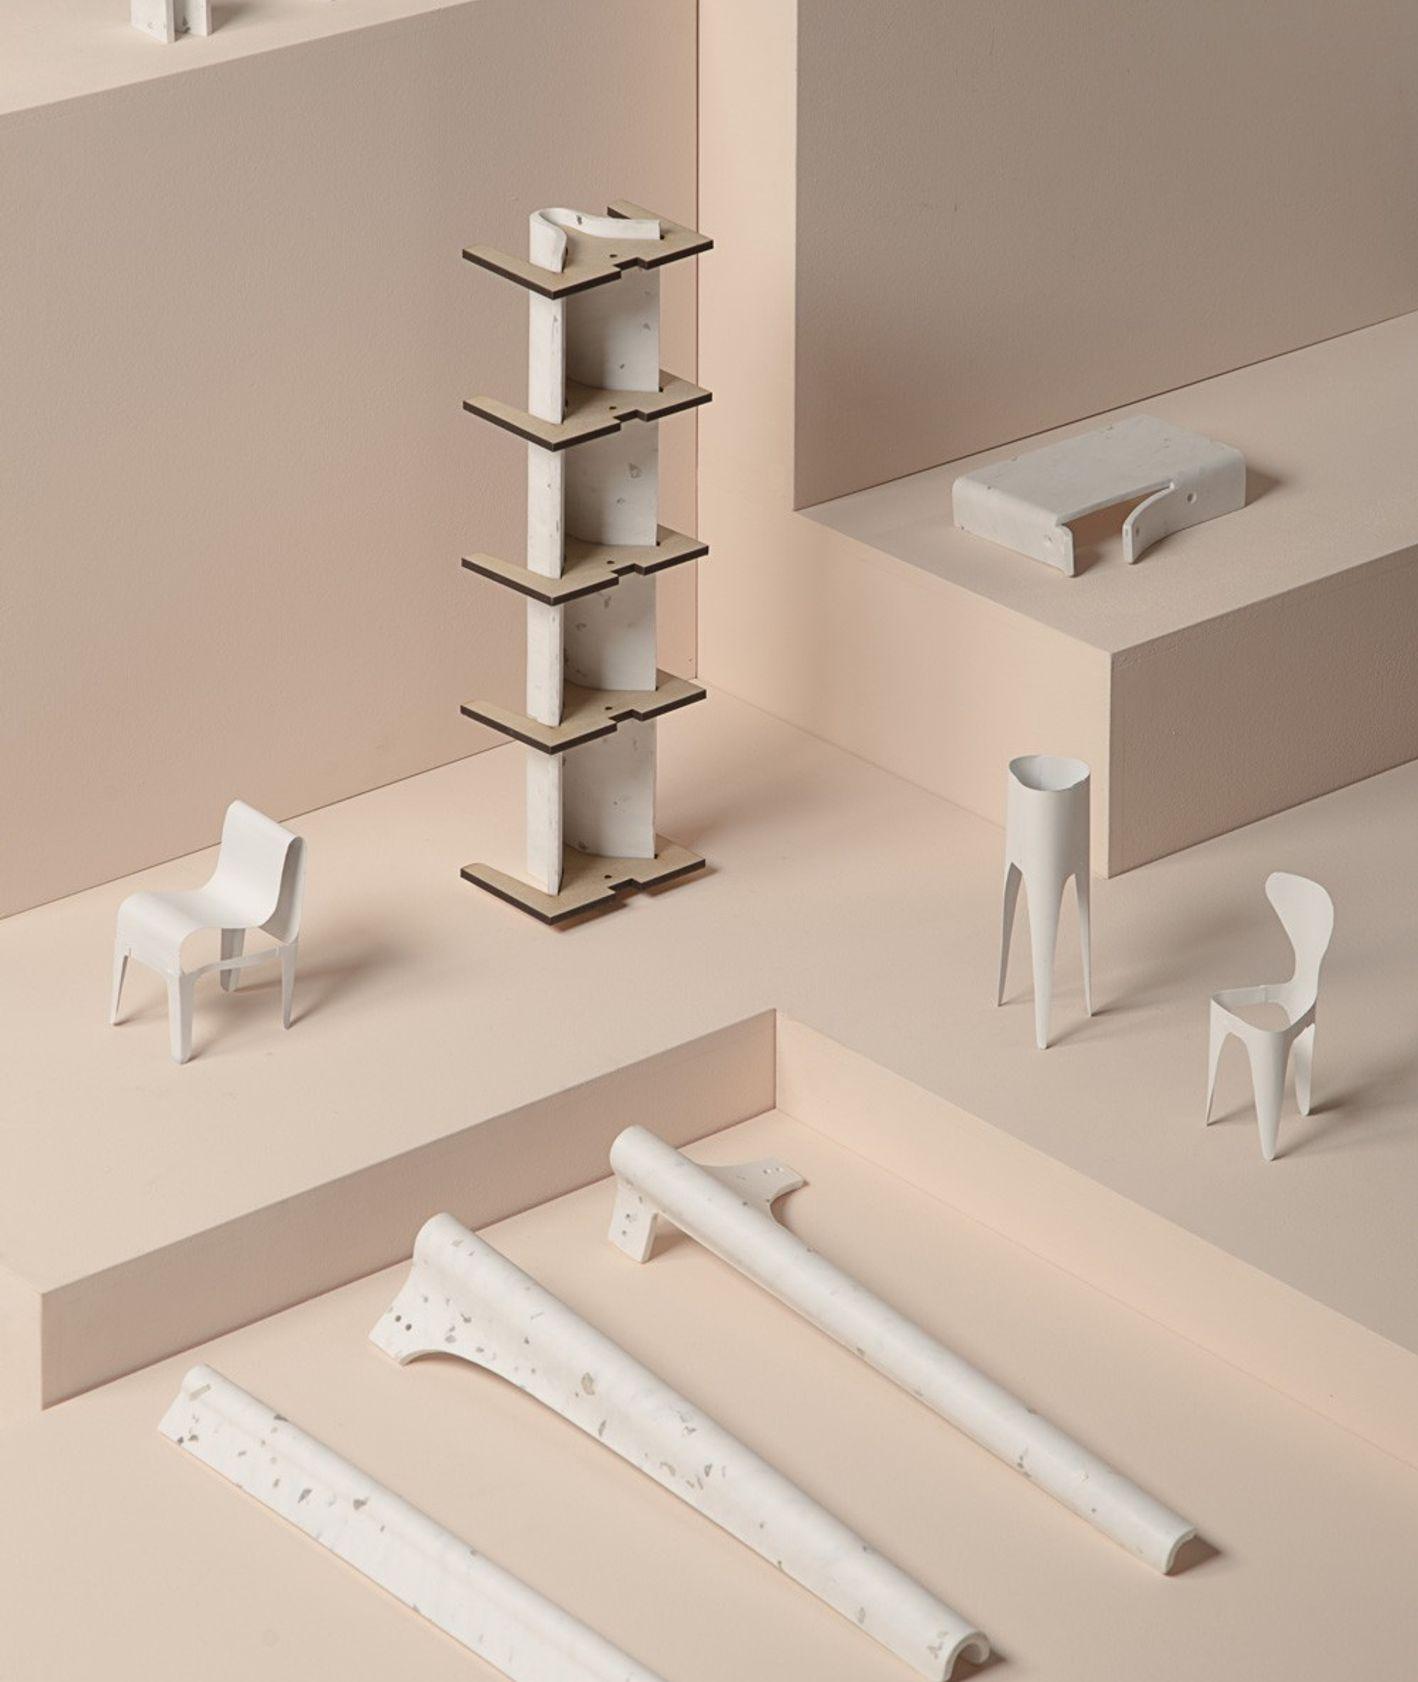 "Nagrodzone w konkursie GUILTLESSPLASTIC meble autorstwa Alexandra Schul, projekt ""Substantial Furniture Line"" (fot.materiały prasowe)"